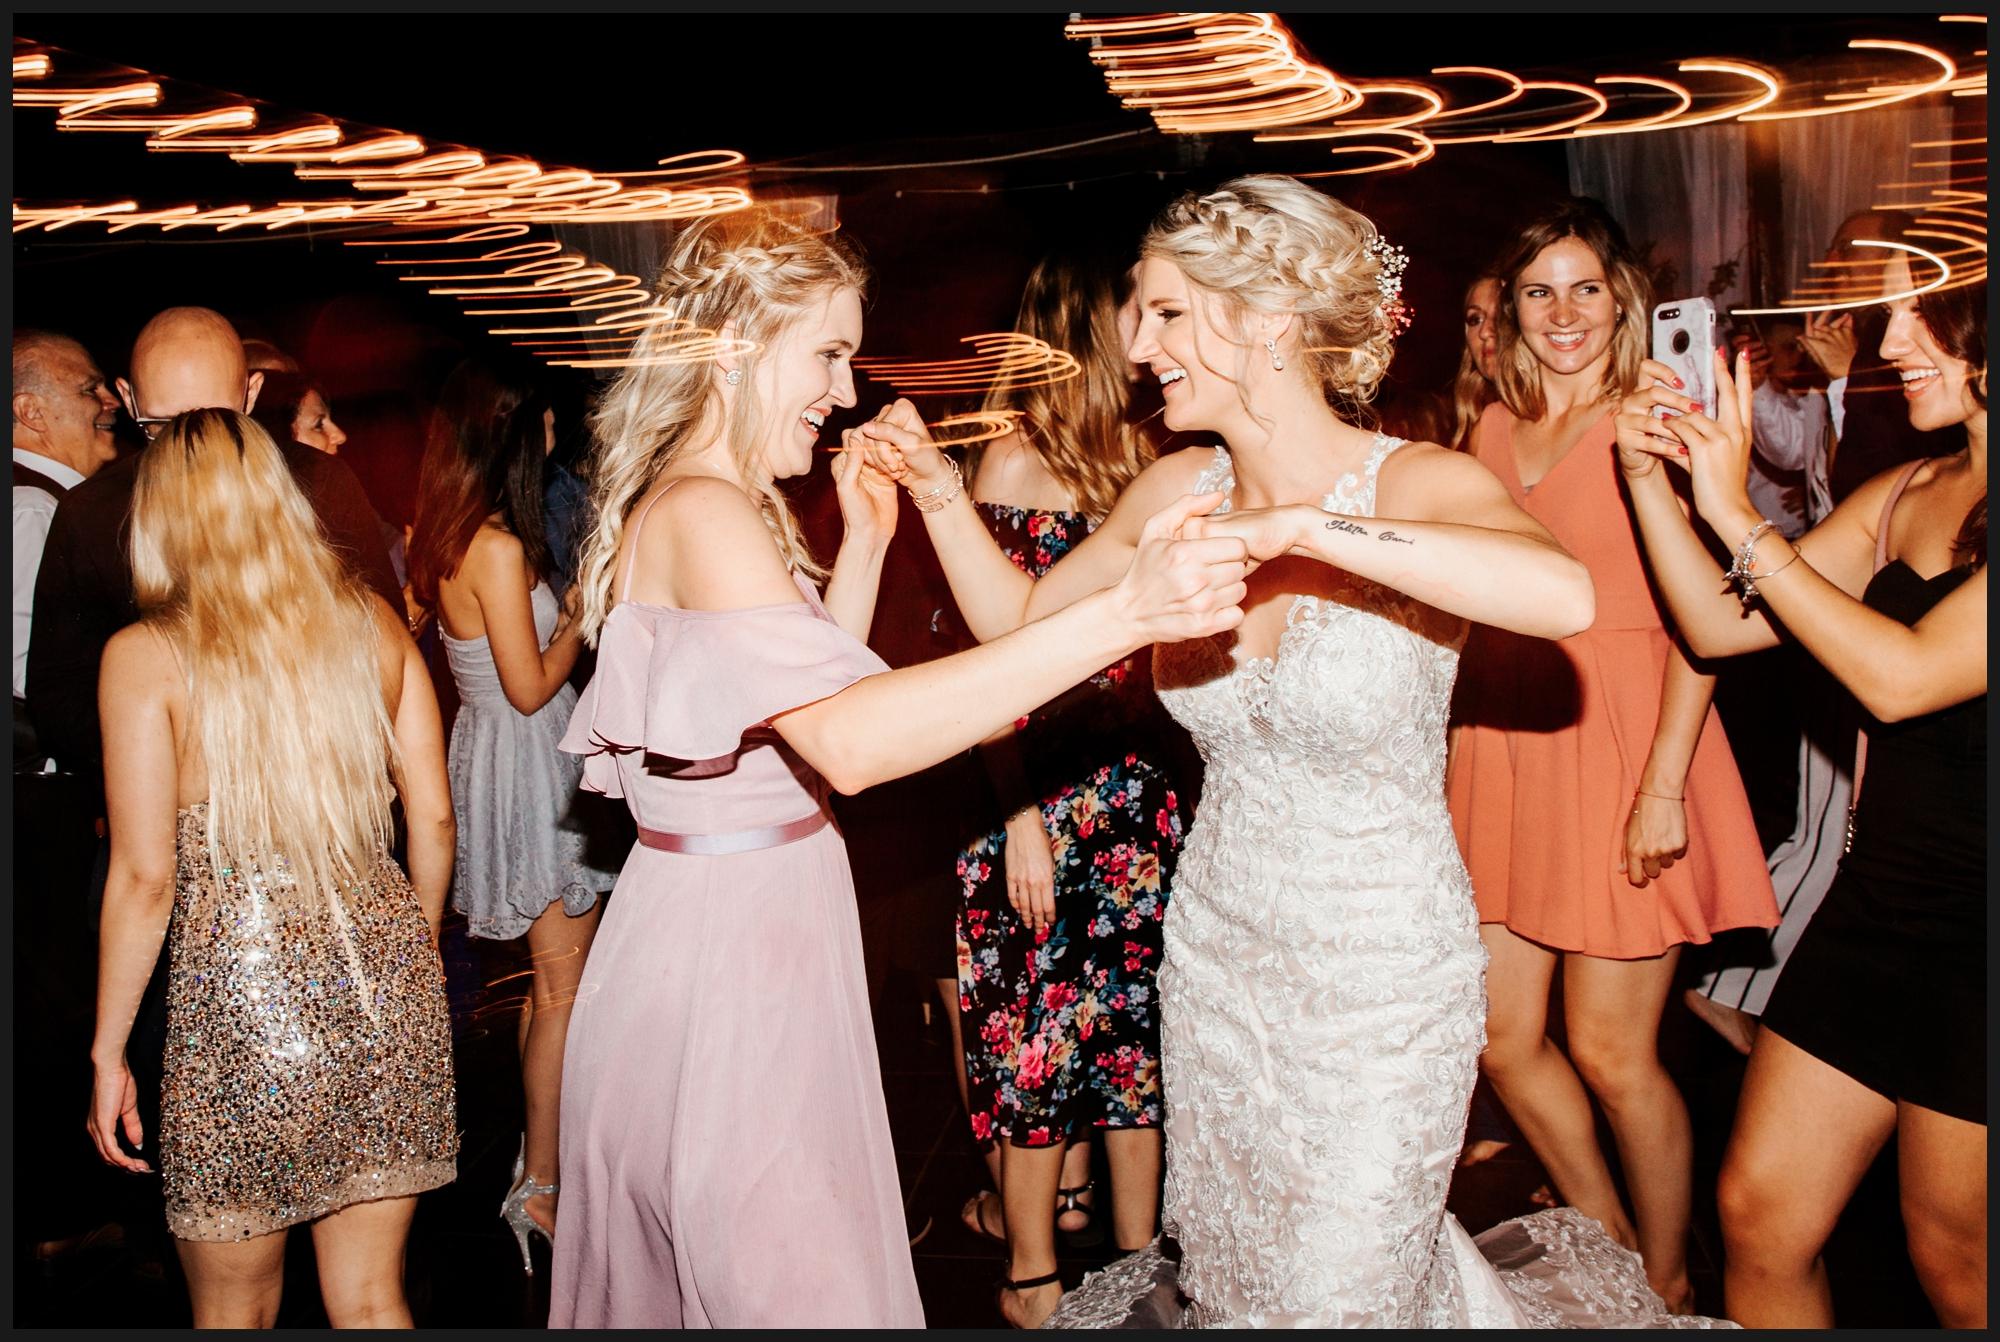 Orlando-Wedding-Photographer-destination-wedding-photographer-florida-wedding-photographer-hawaii-wedding-photographer_0625.jpg